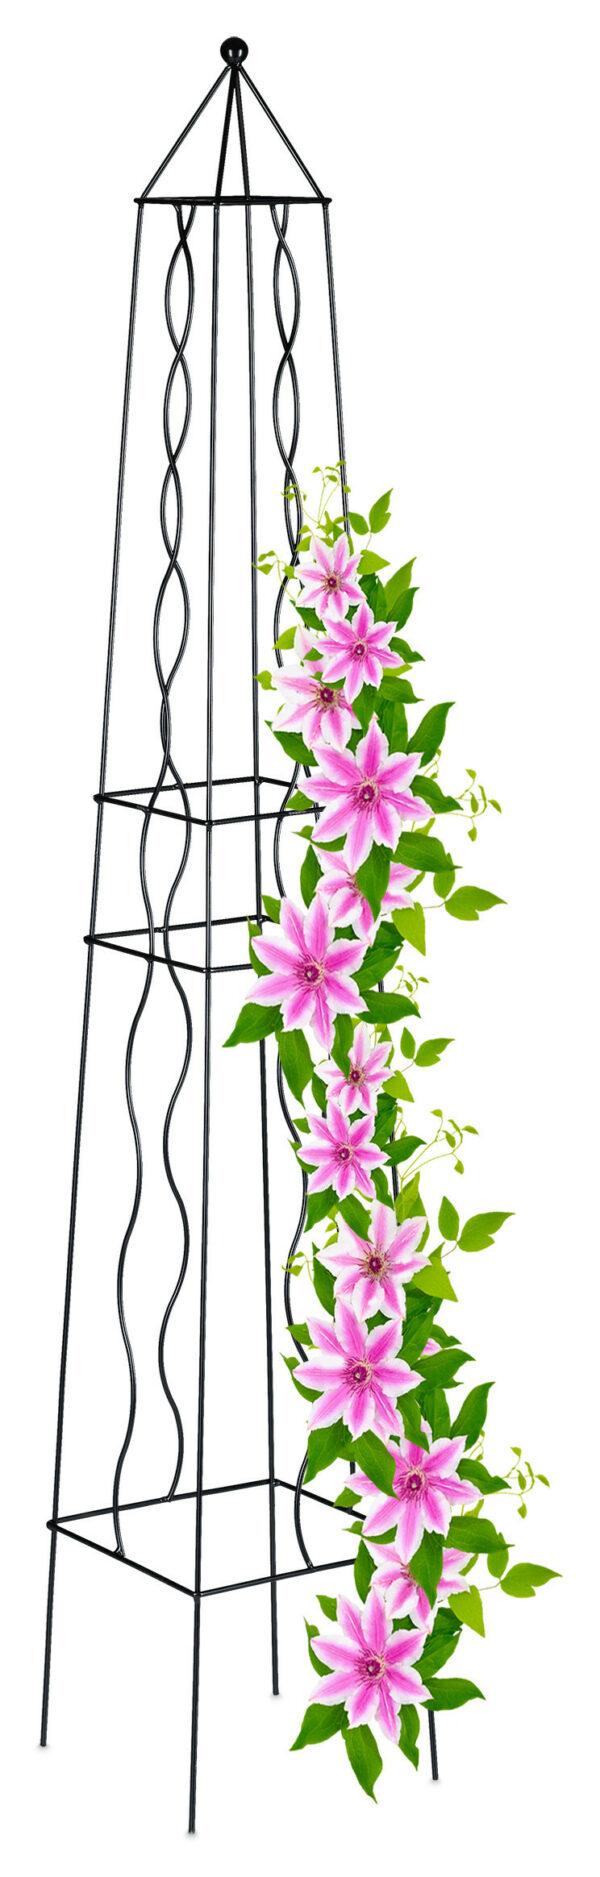 Relaxdays garden obelisk, metal trellis, climbing aid for plants, growing frame, weatherproof, steel, 122 cm (H), black